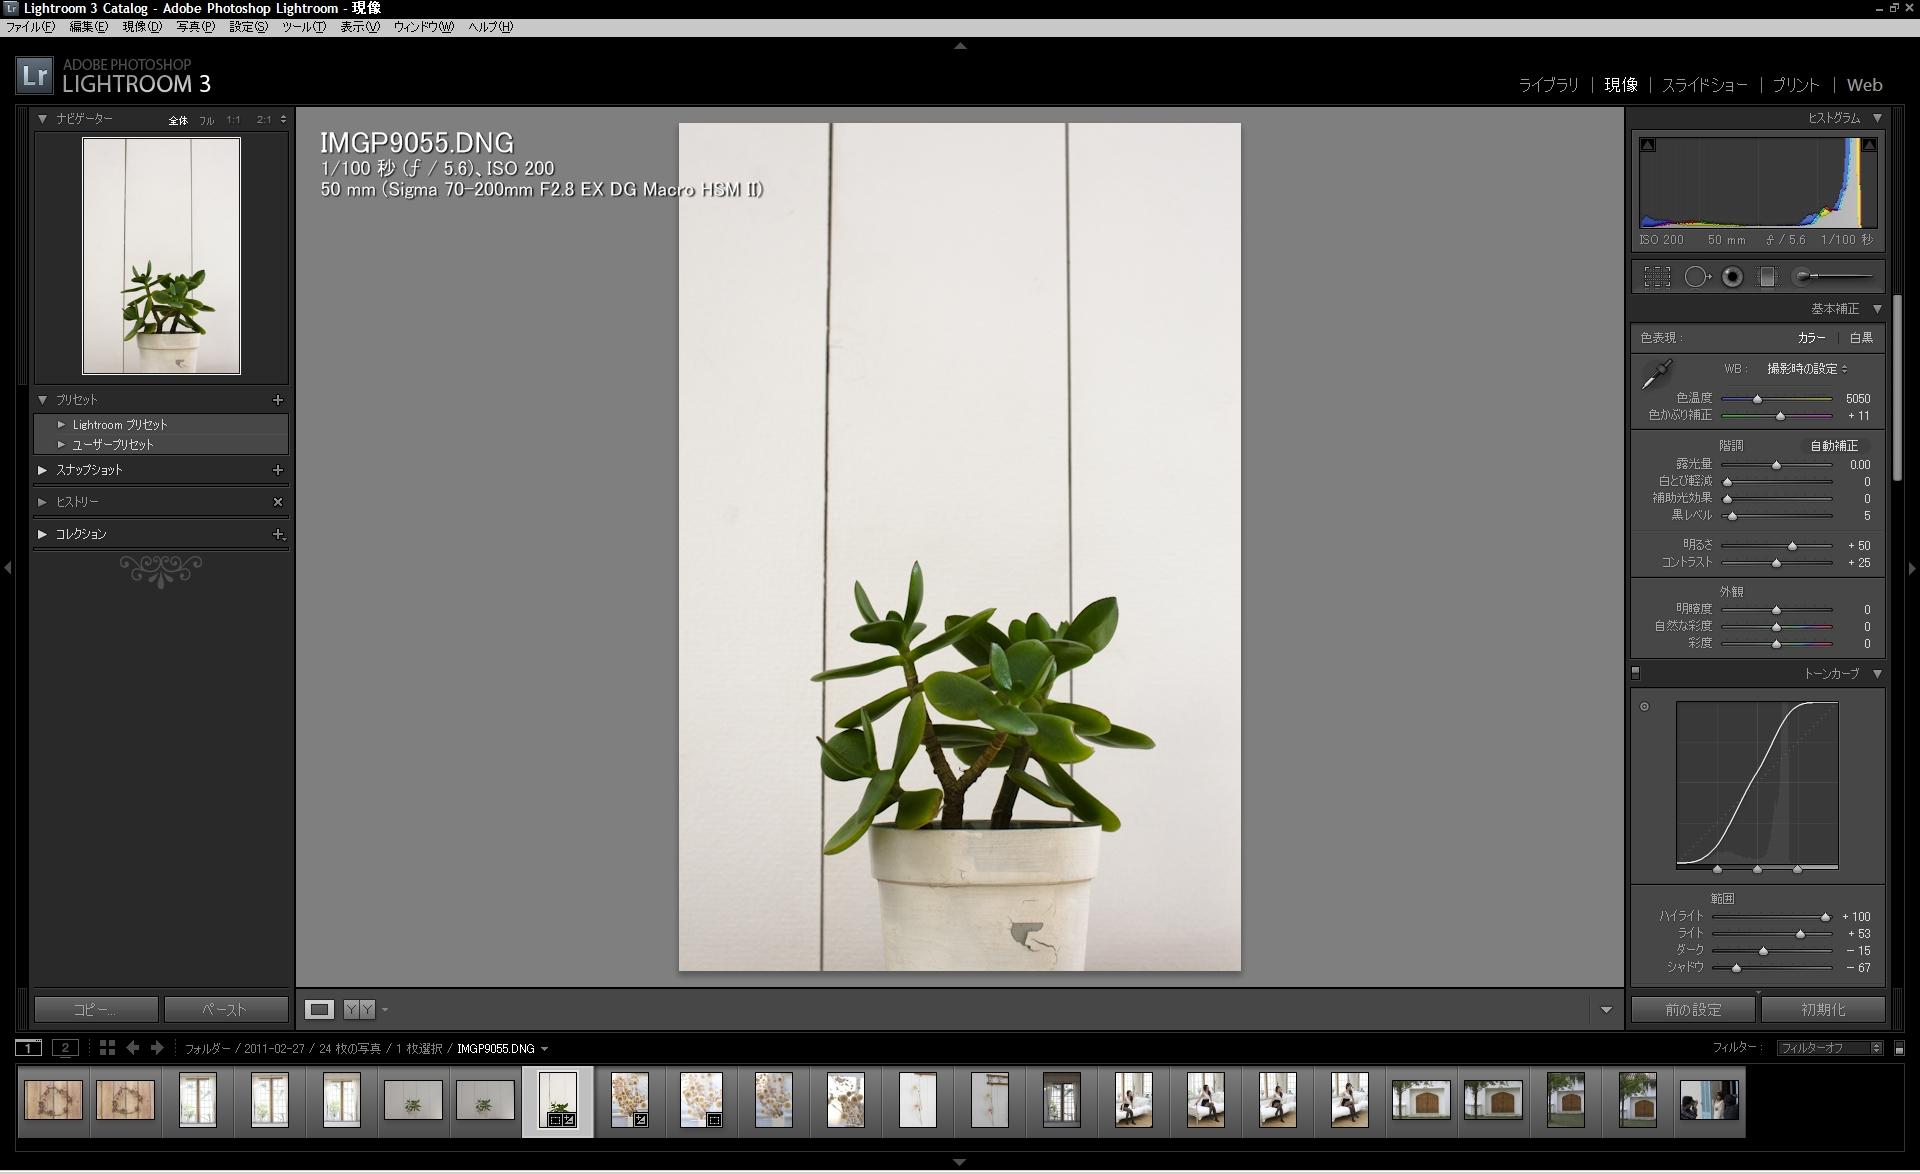 <b>Photoshop Lightroom 3</b>